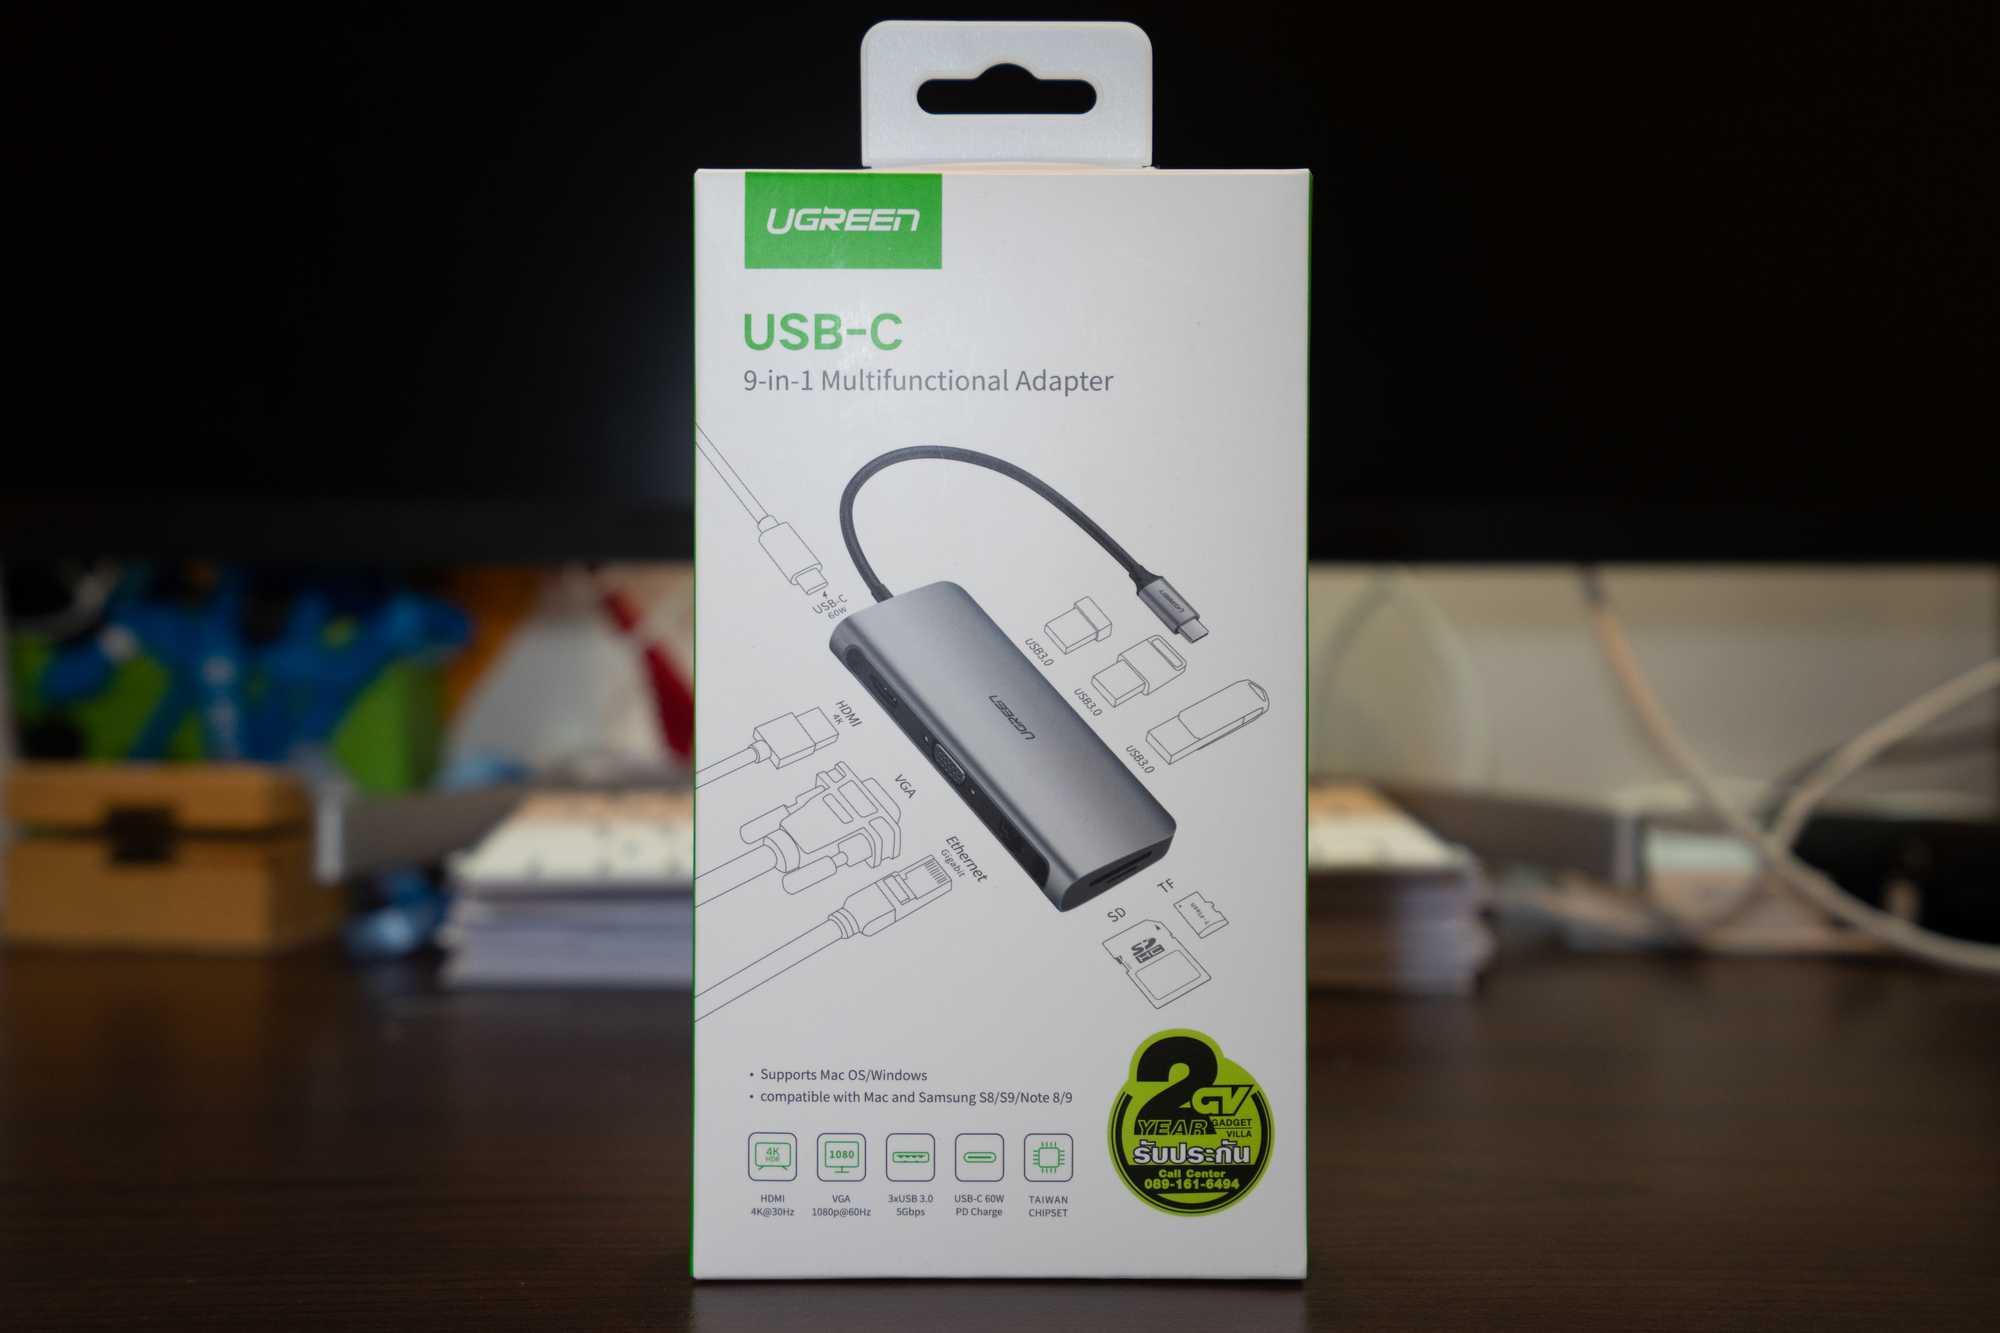 UGREEN USB-C 9-in 1 Multifunctional Adapter หน้ากล่อง